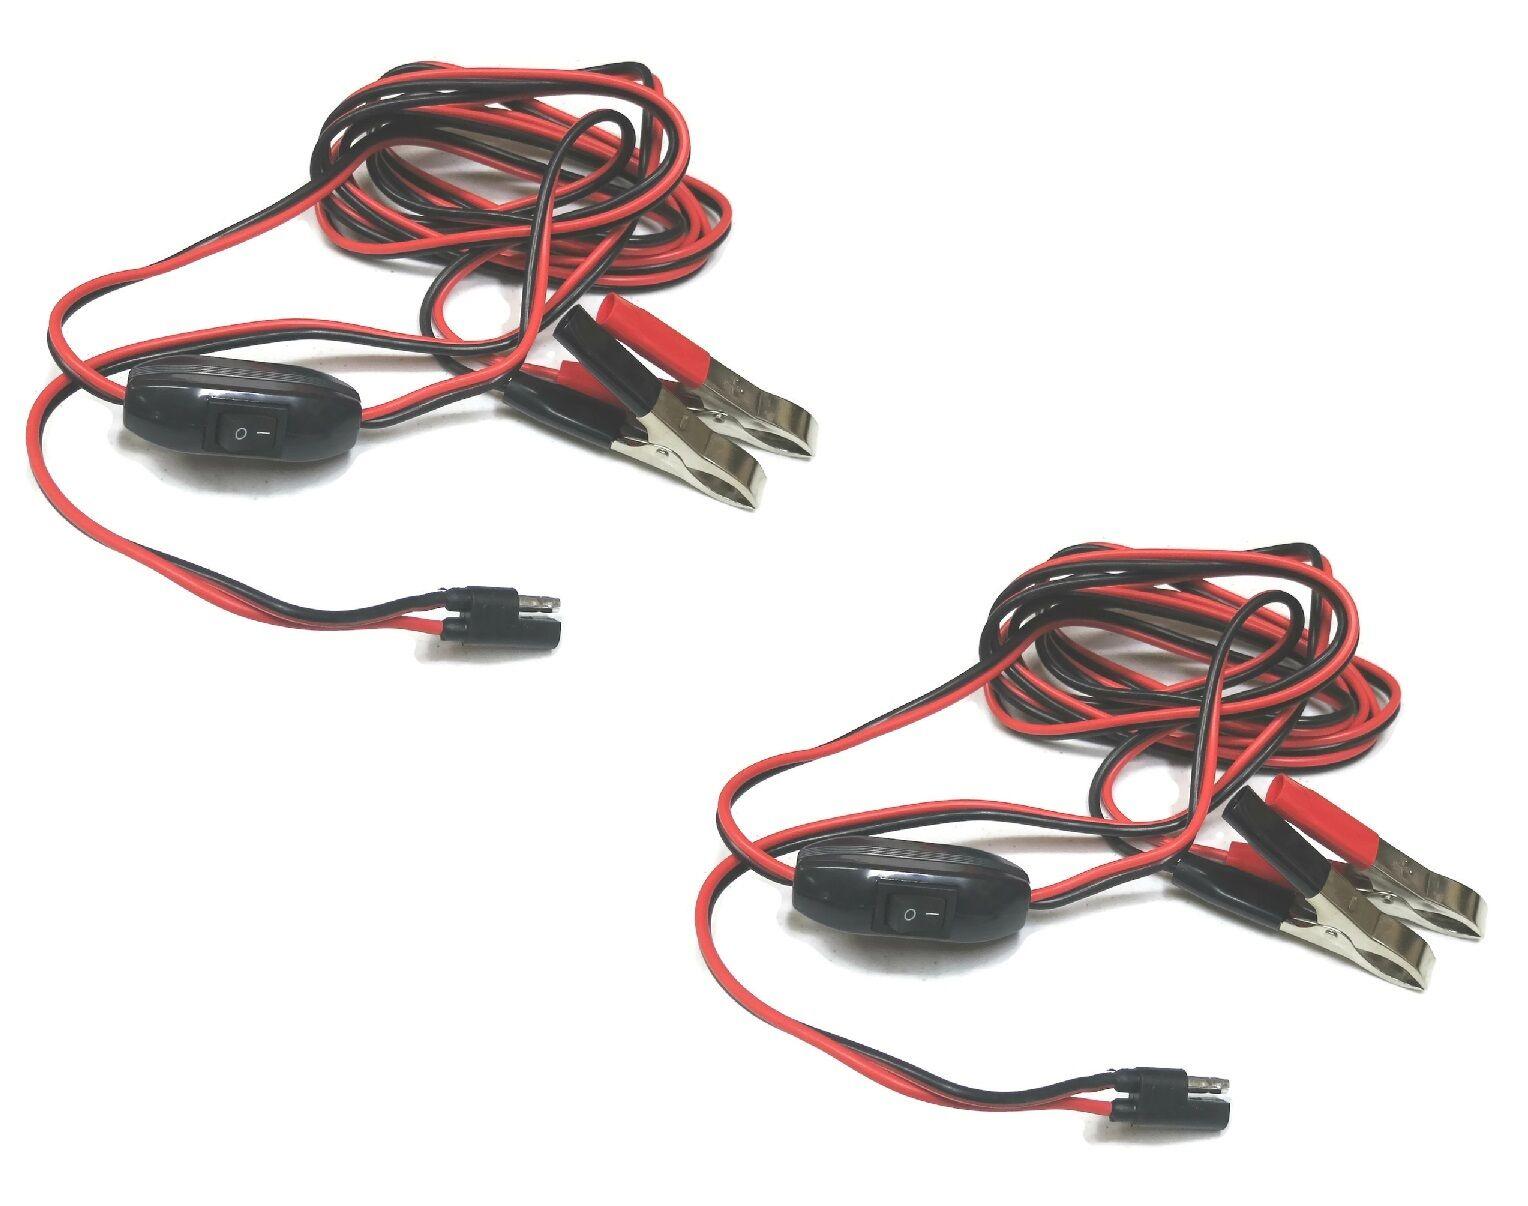 2 8 Ft Wiring Harness Power Plug Kit For 12v Demand Diaphragm Australia Water Pumps